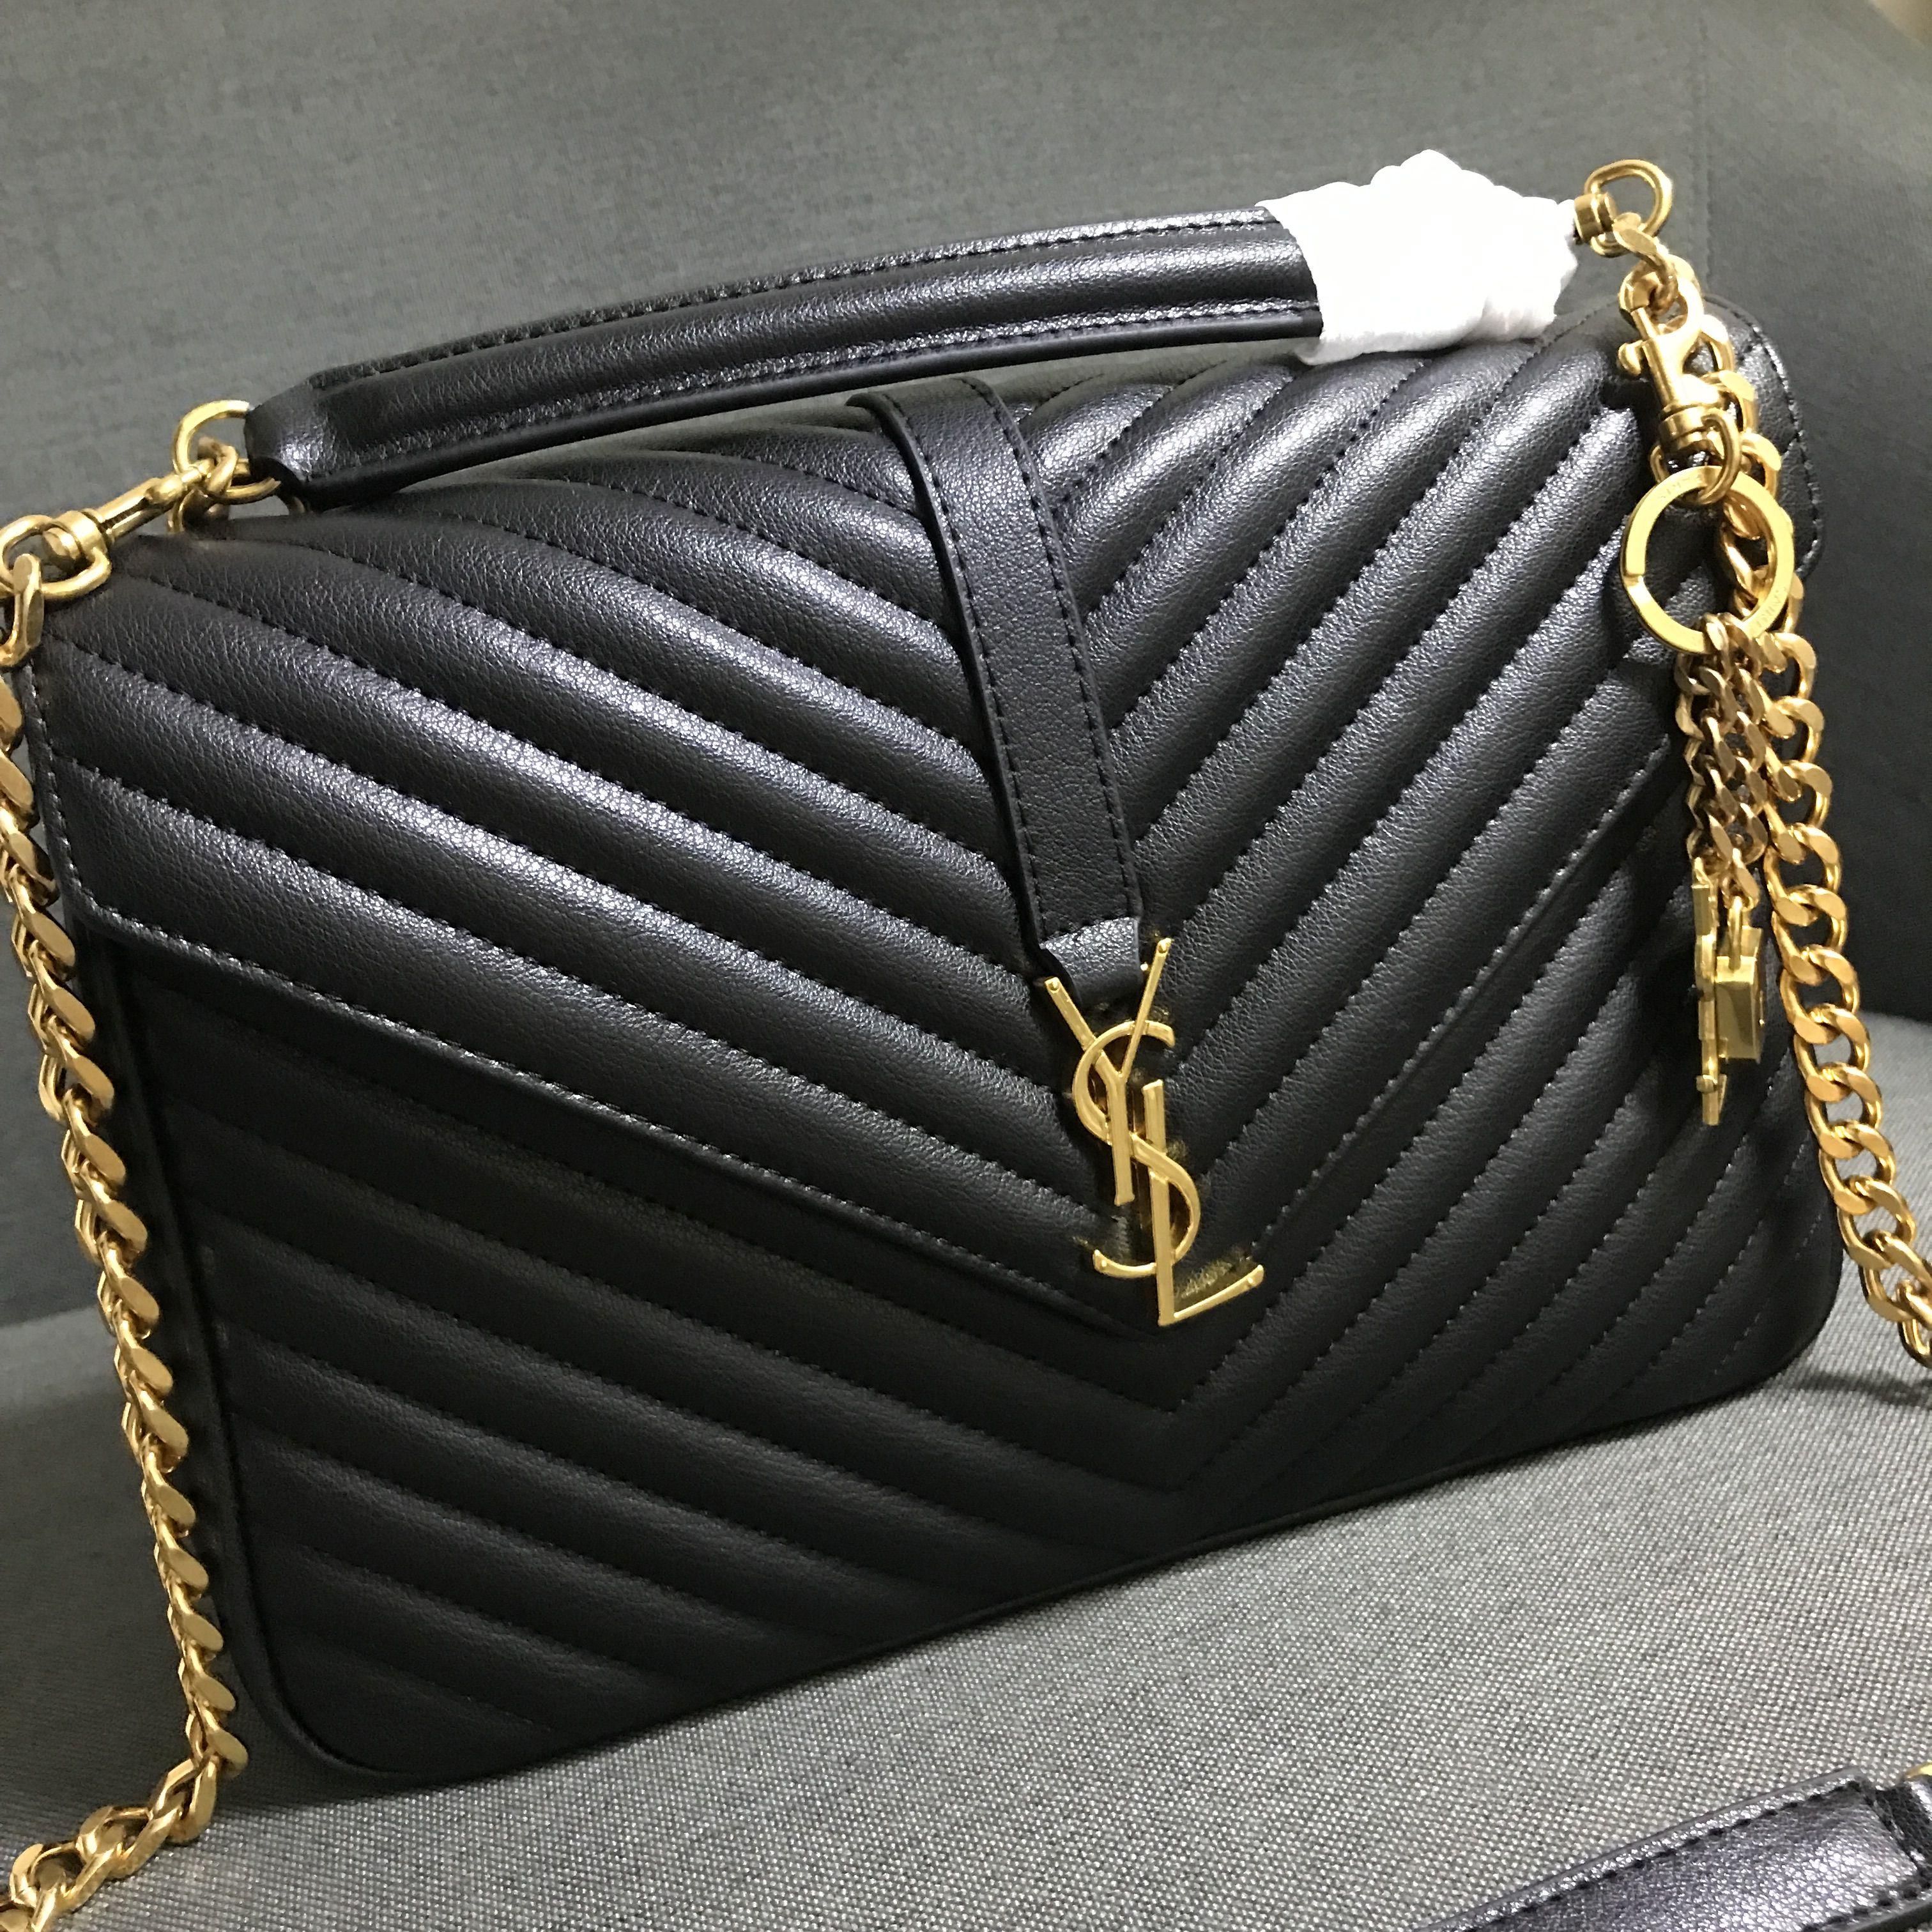 eca36ec2d9 YSL Saint Laurent woman college bag large size v pattern black gold ...